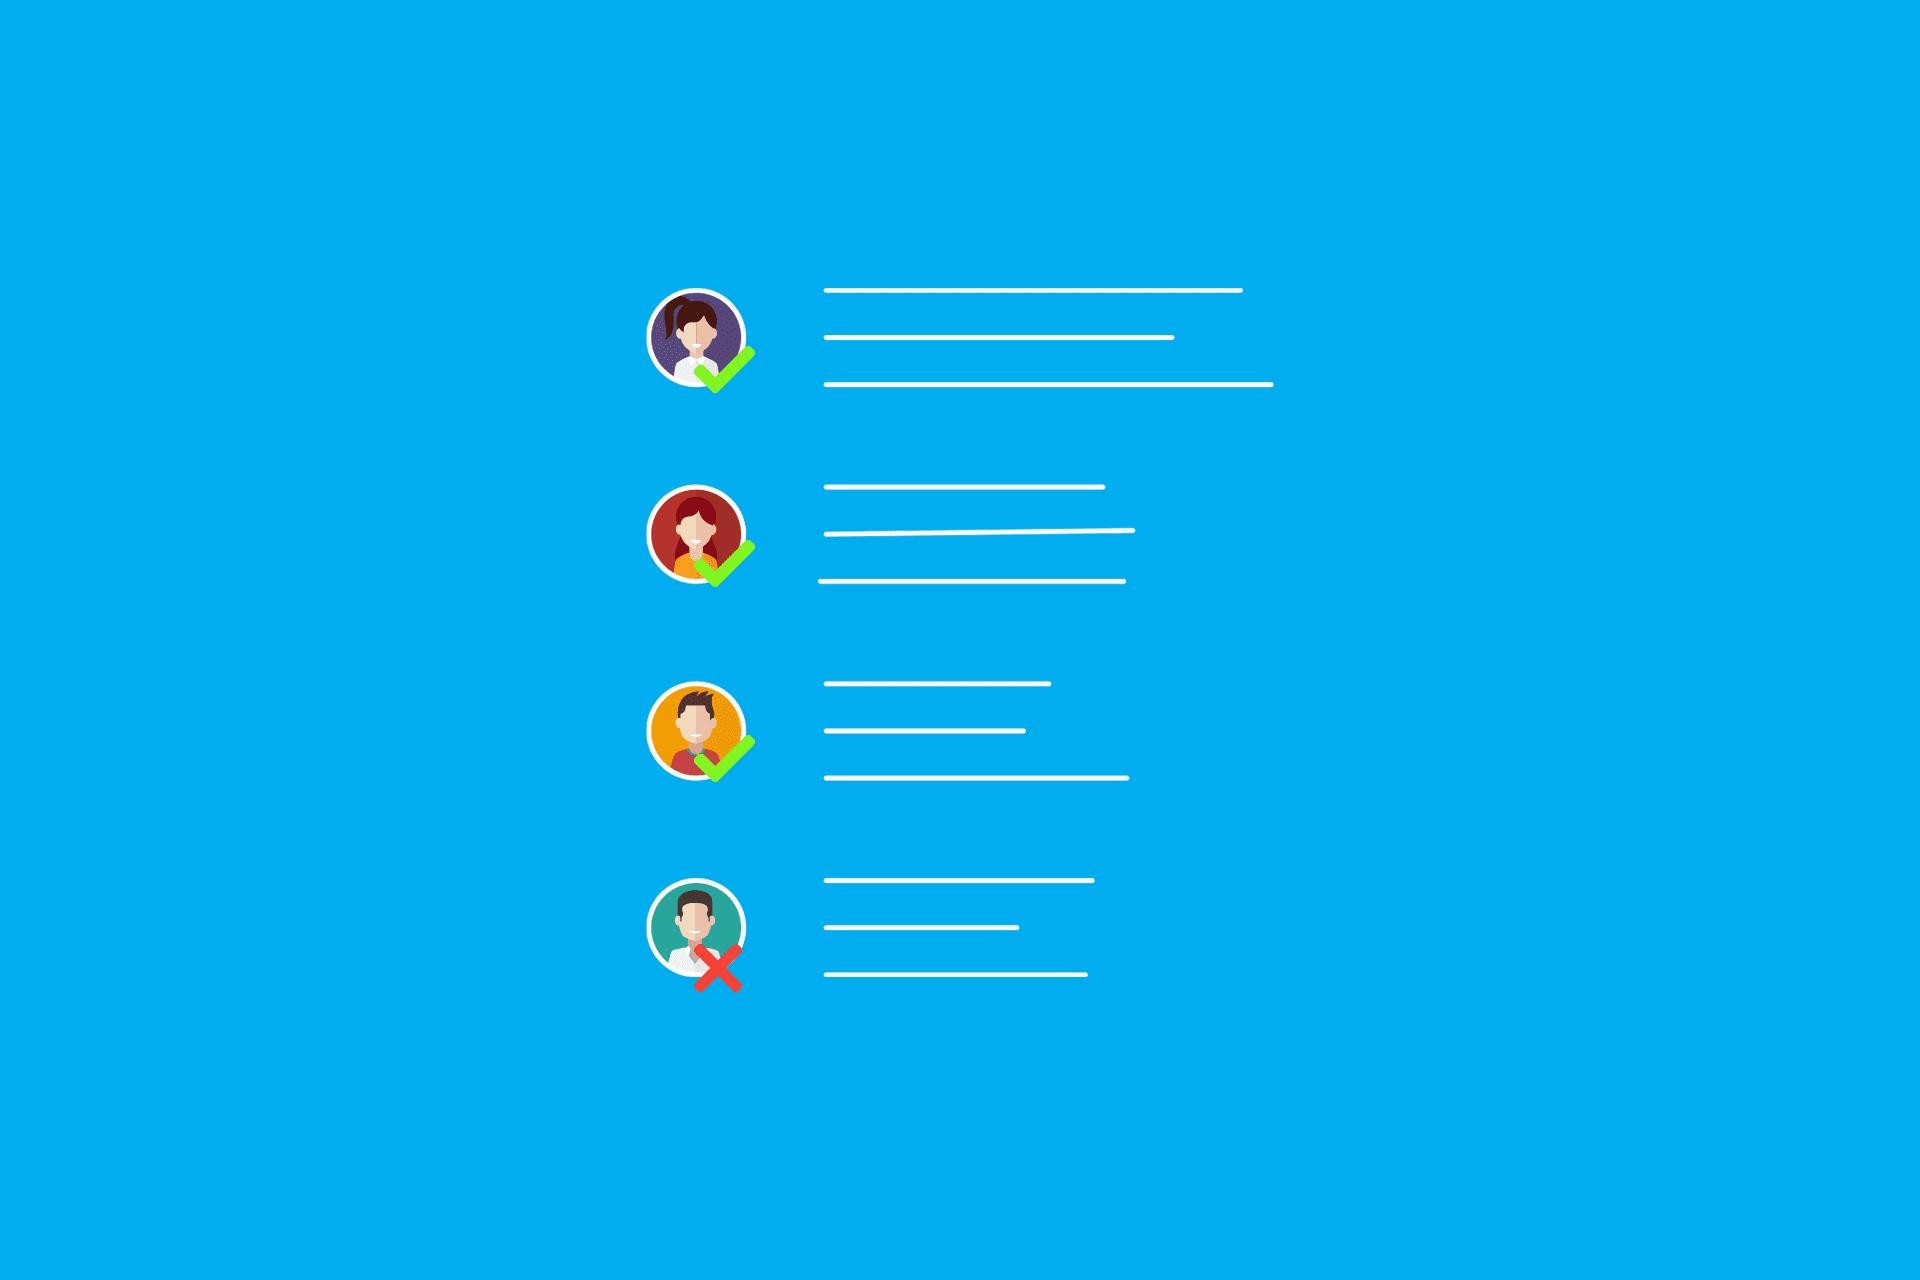 credenciamento de eventos online